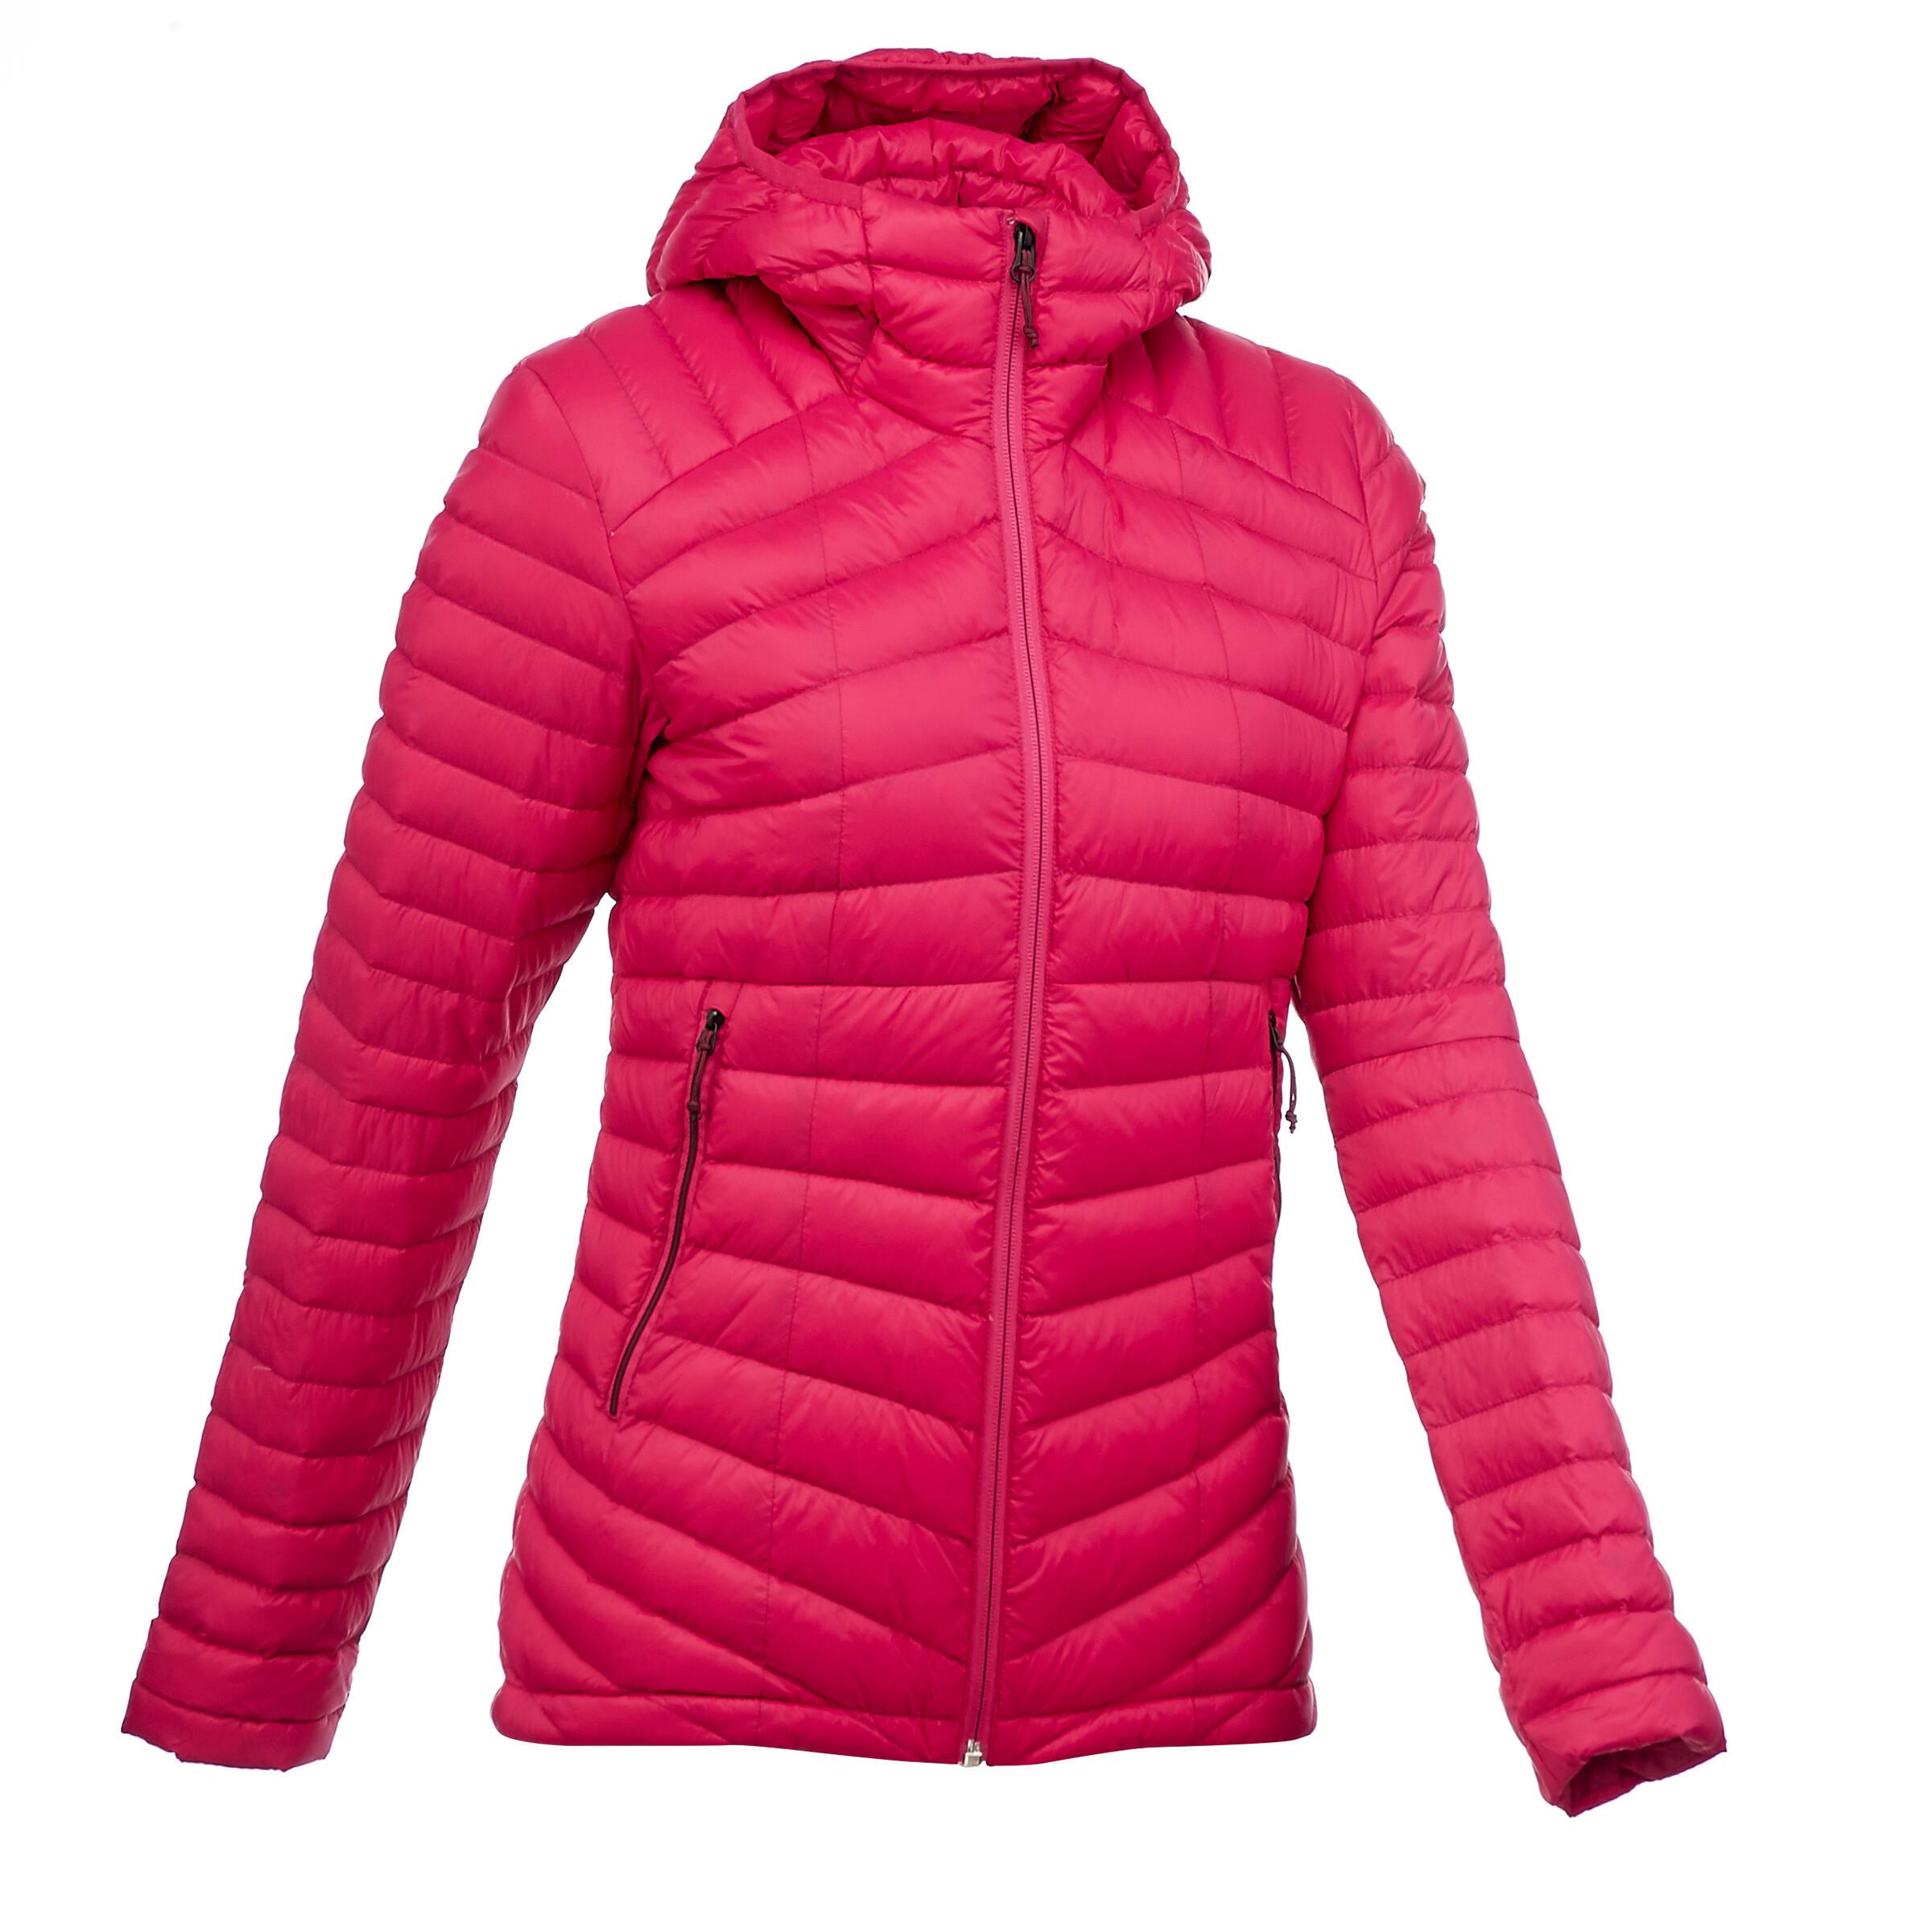 big sale 51676 6cfd0 Daunenjacke | Online bestellen | Quechua | Decathlon